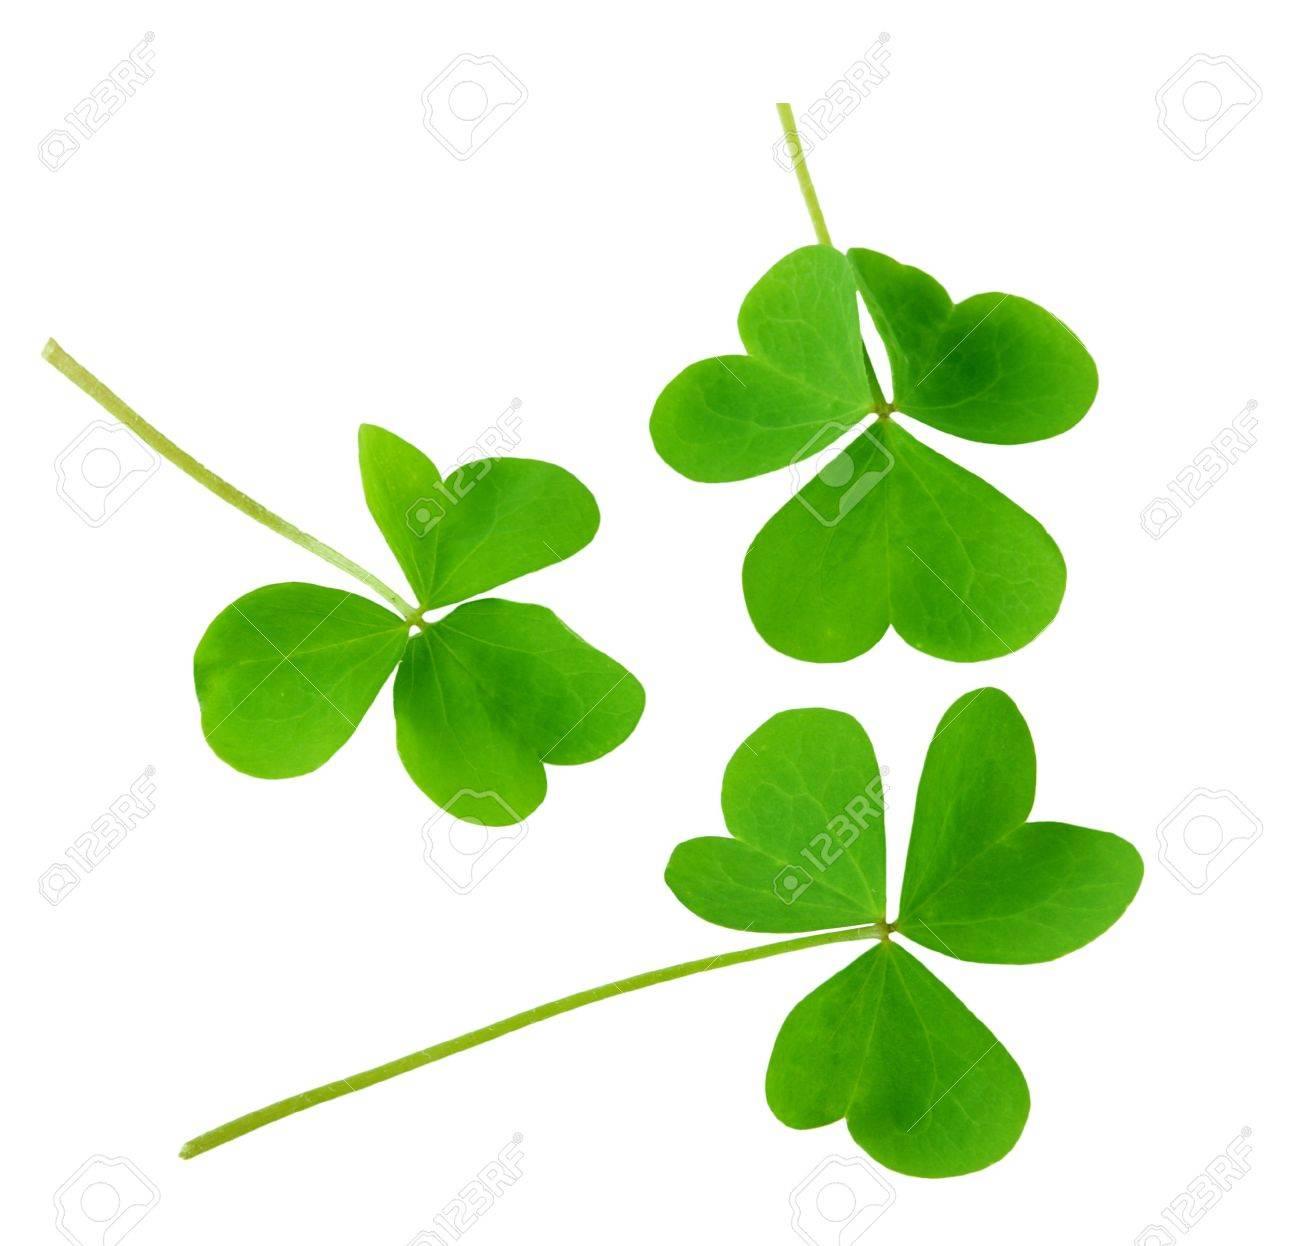 three green shamrock leaves isolated on white background stock